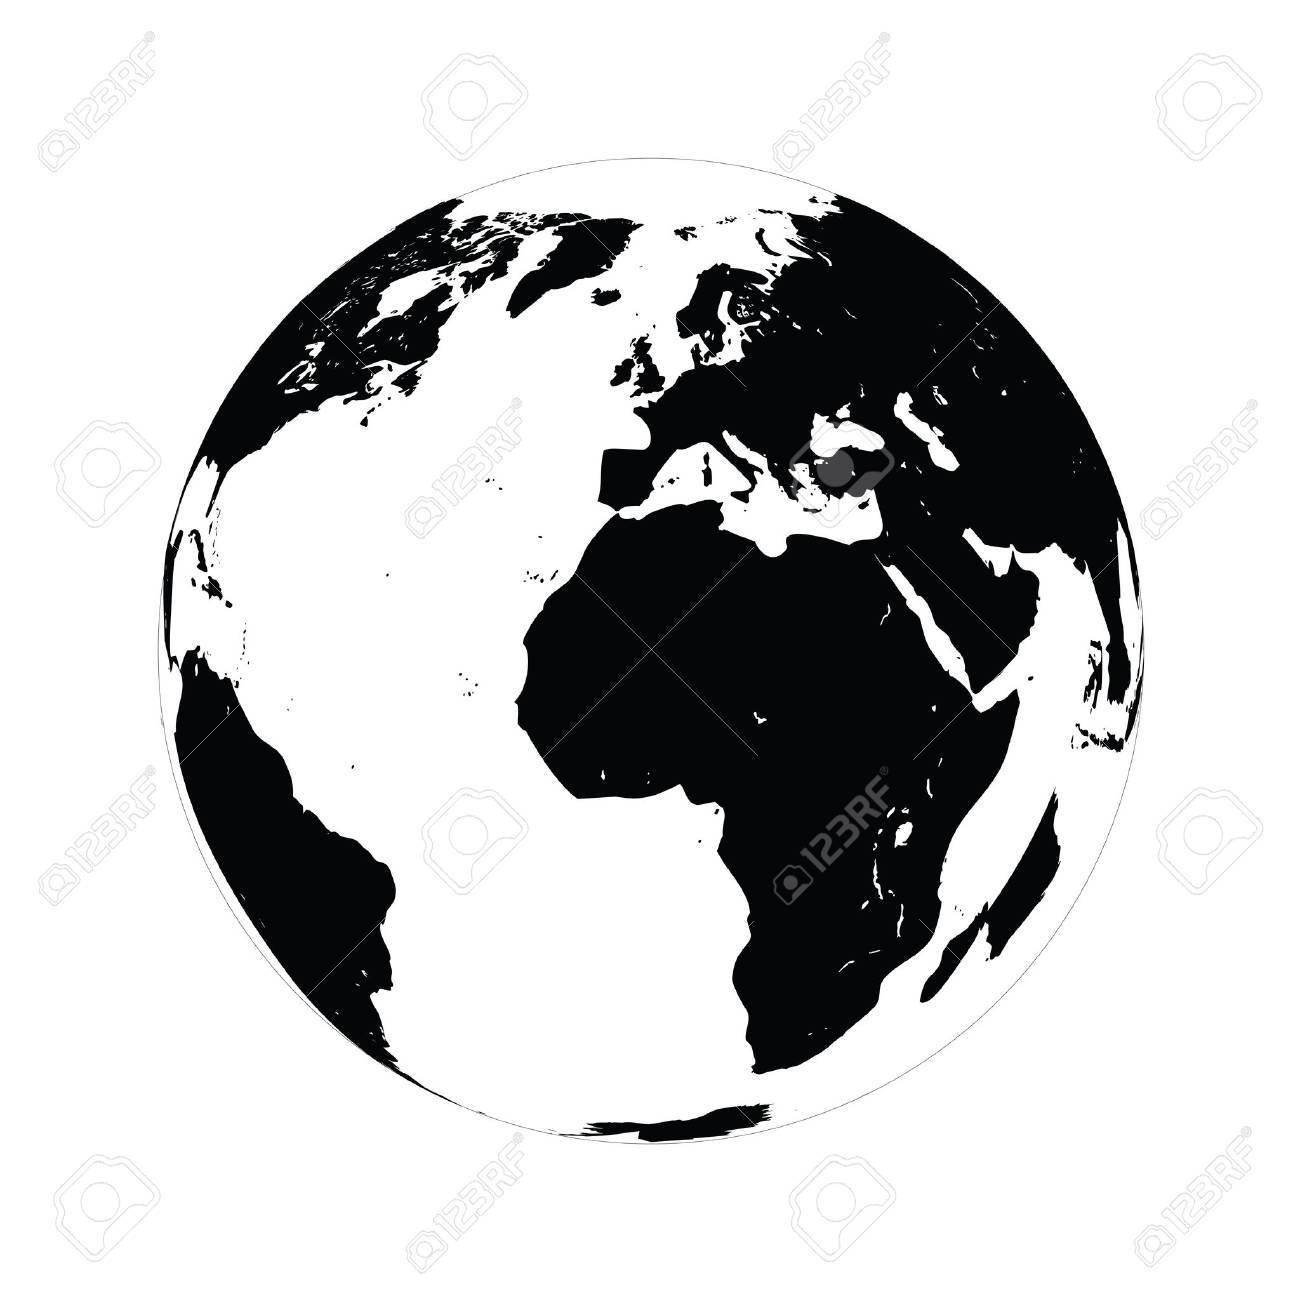 Wonderful Simple Black Globe Vector Illustration On White Background. Stock Vector    86617503